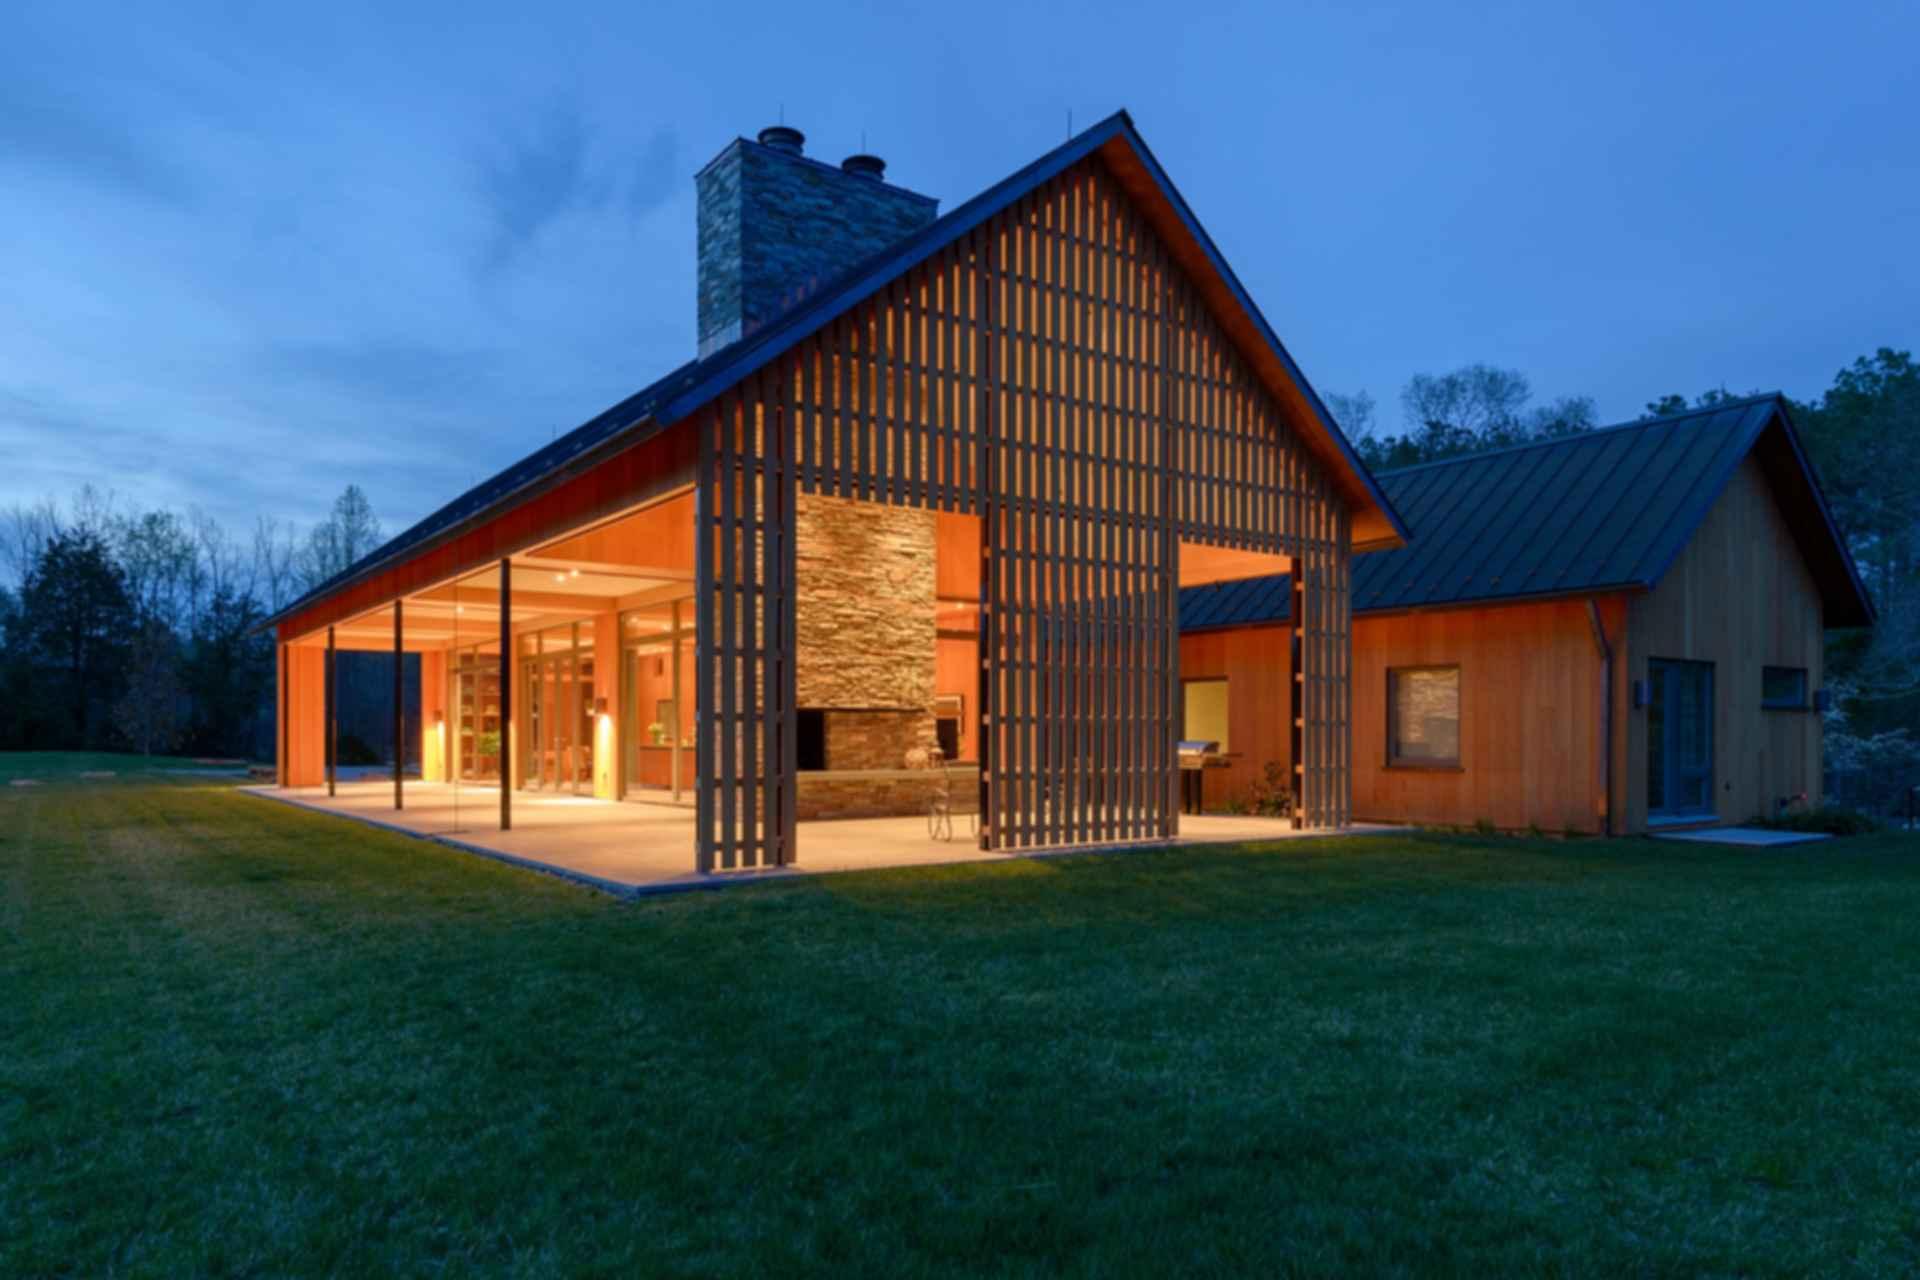 Contemporary Barn Residence - At Night